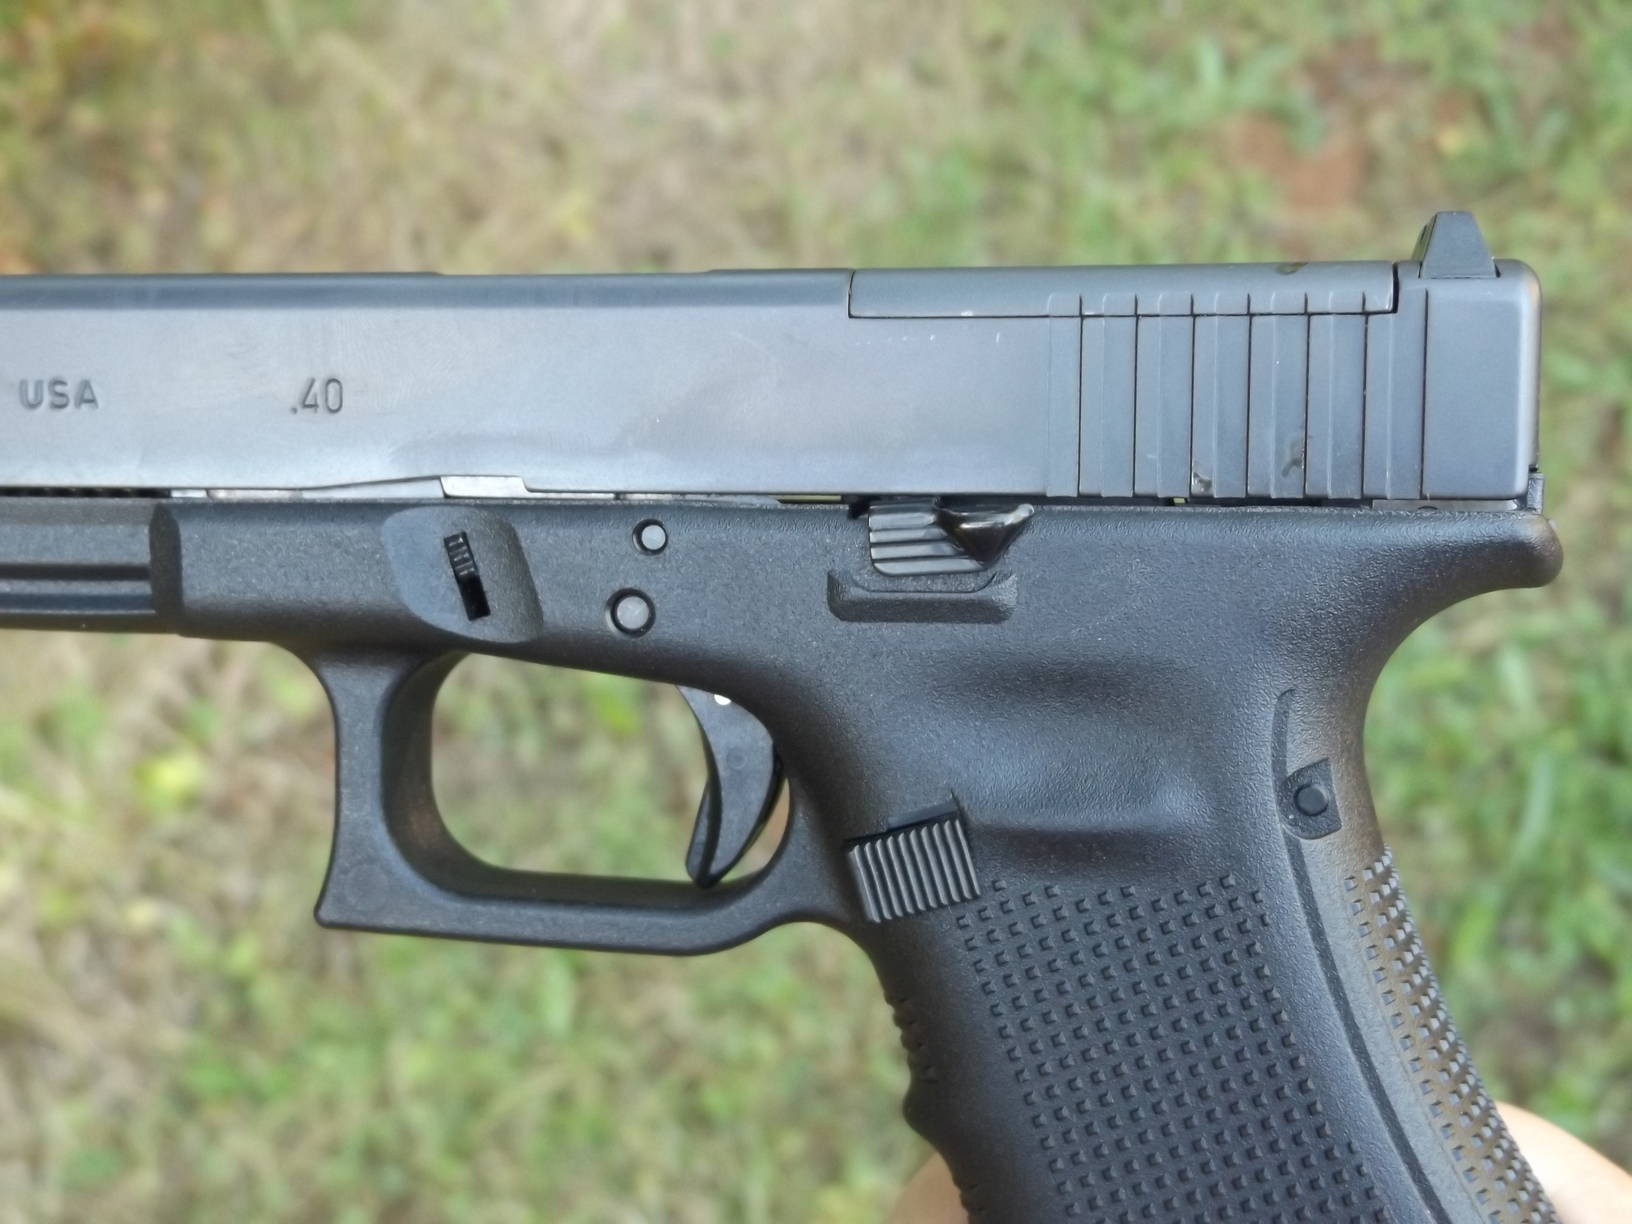 Glock Model 35, Gen 4, by Pat Cascio - SurvivalBlog.com